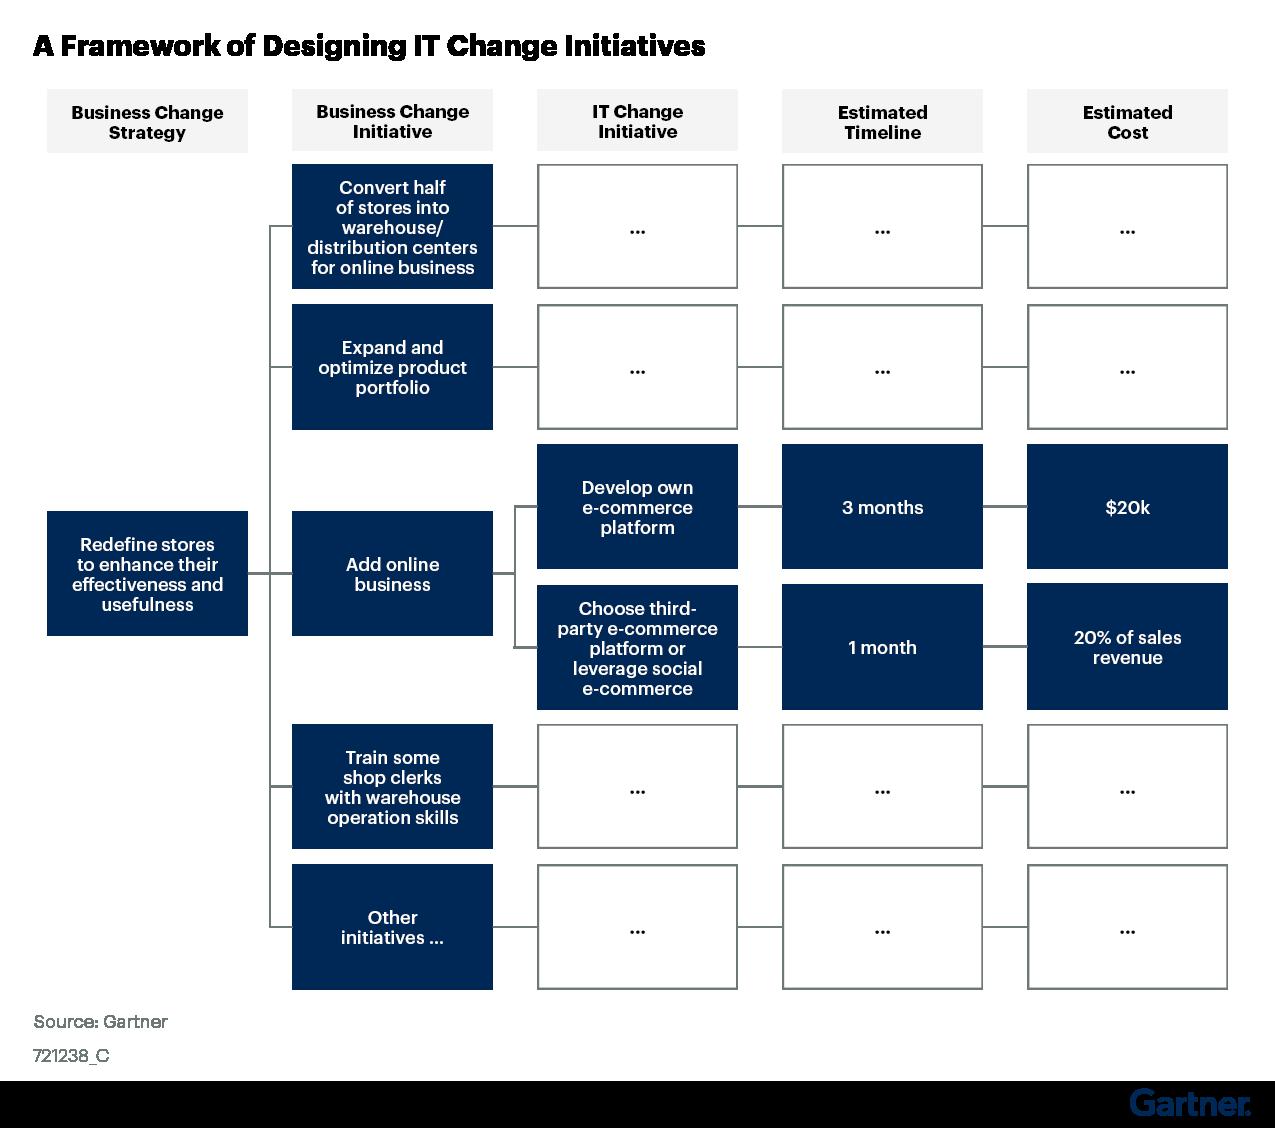 Figure 6. A Framework of Designing IT Change Initiatives